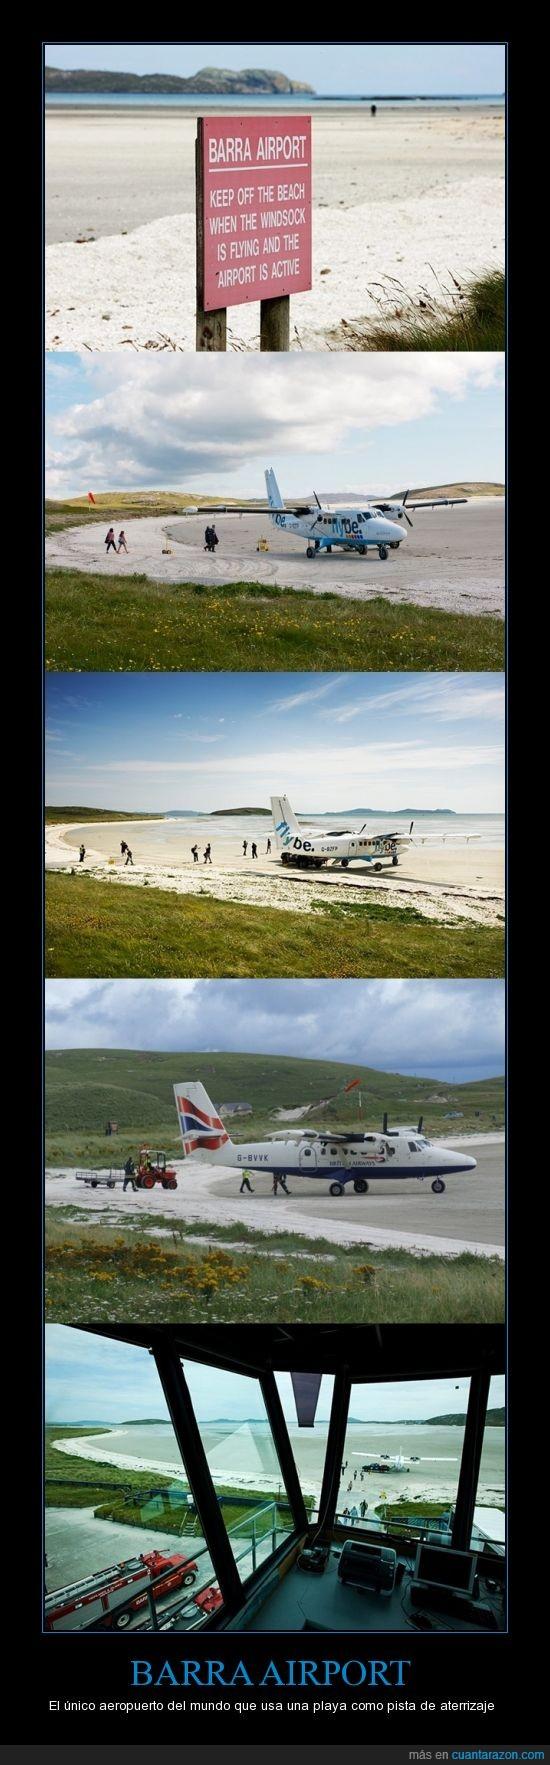 aeropuerto,Barra,Barra Eoligarry Airport,Escocia,Hébridas Exteriores,pista de aterrizaje,playa